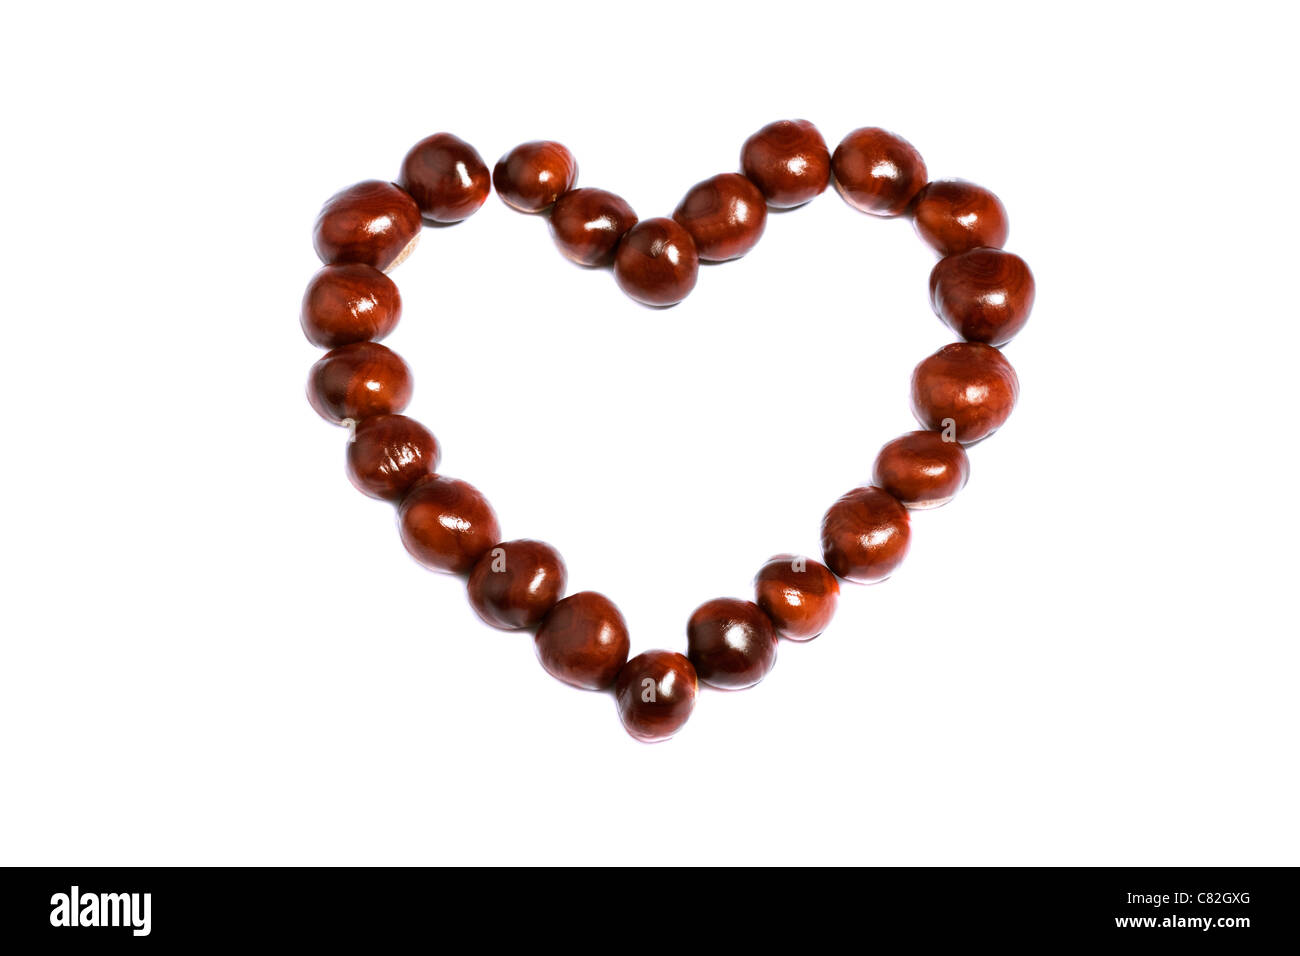 Corazón de castañas sobre fondo blanco. Imagen De Stock